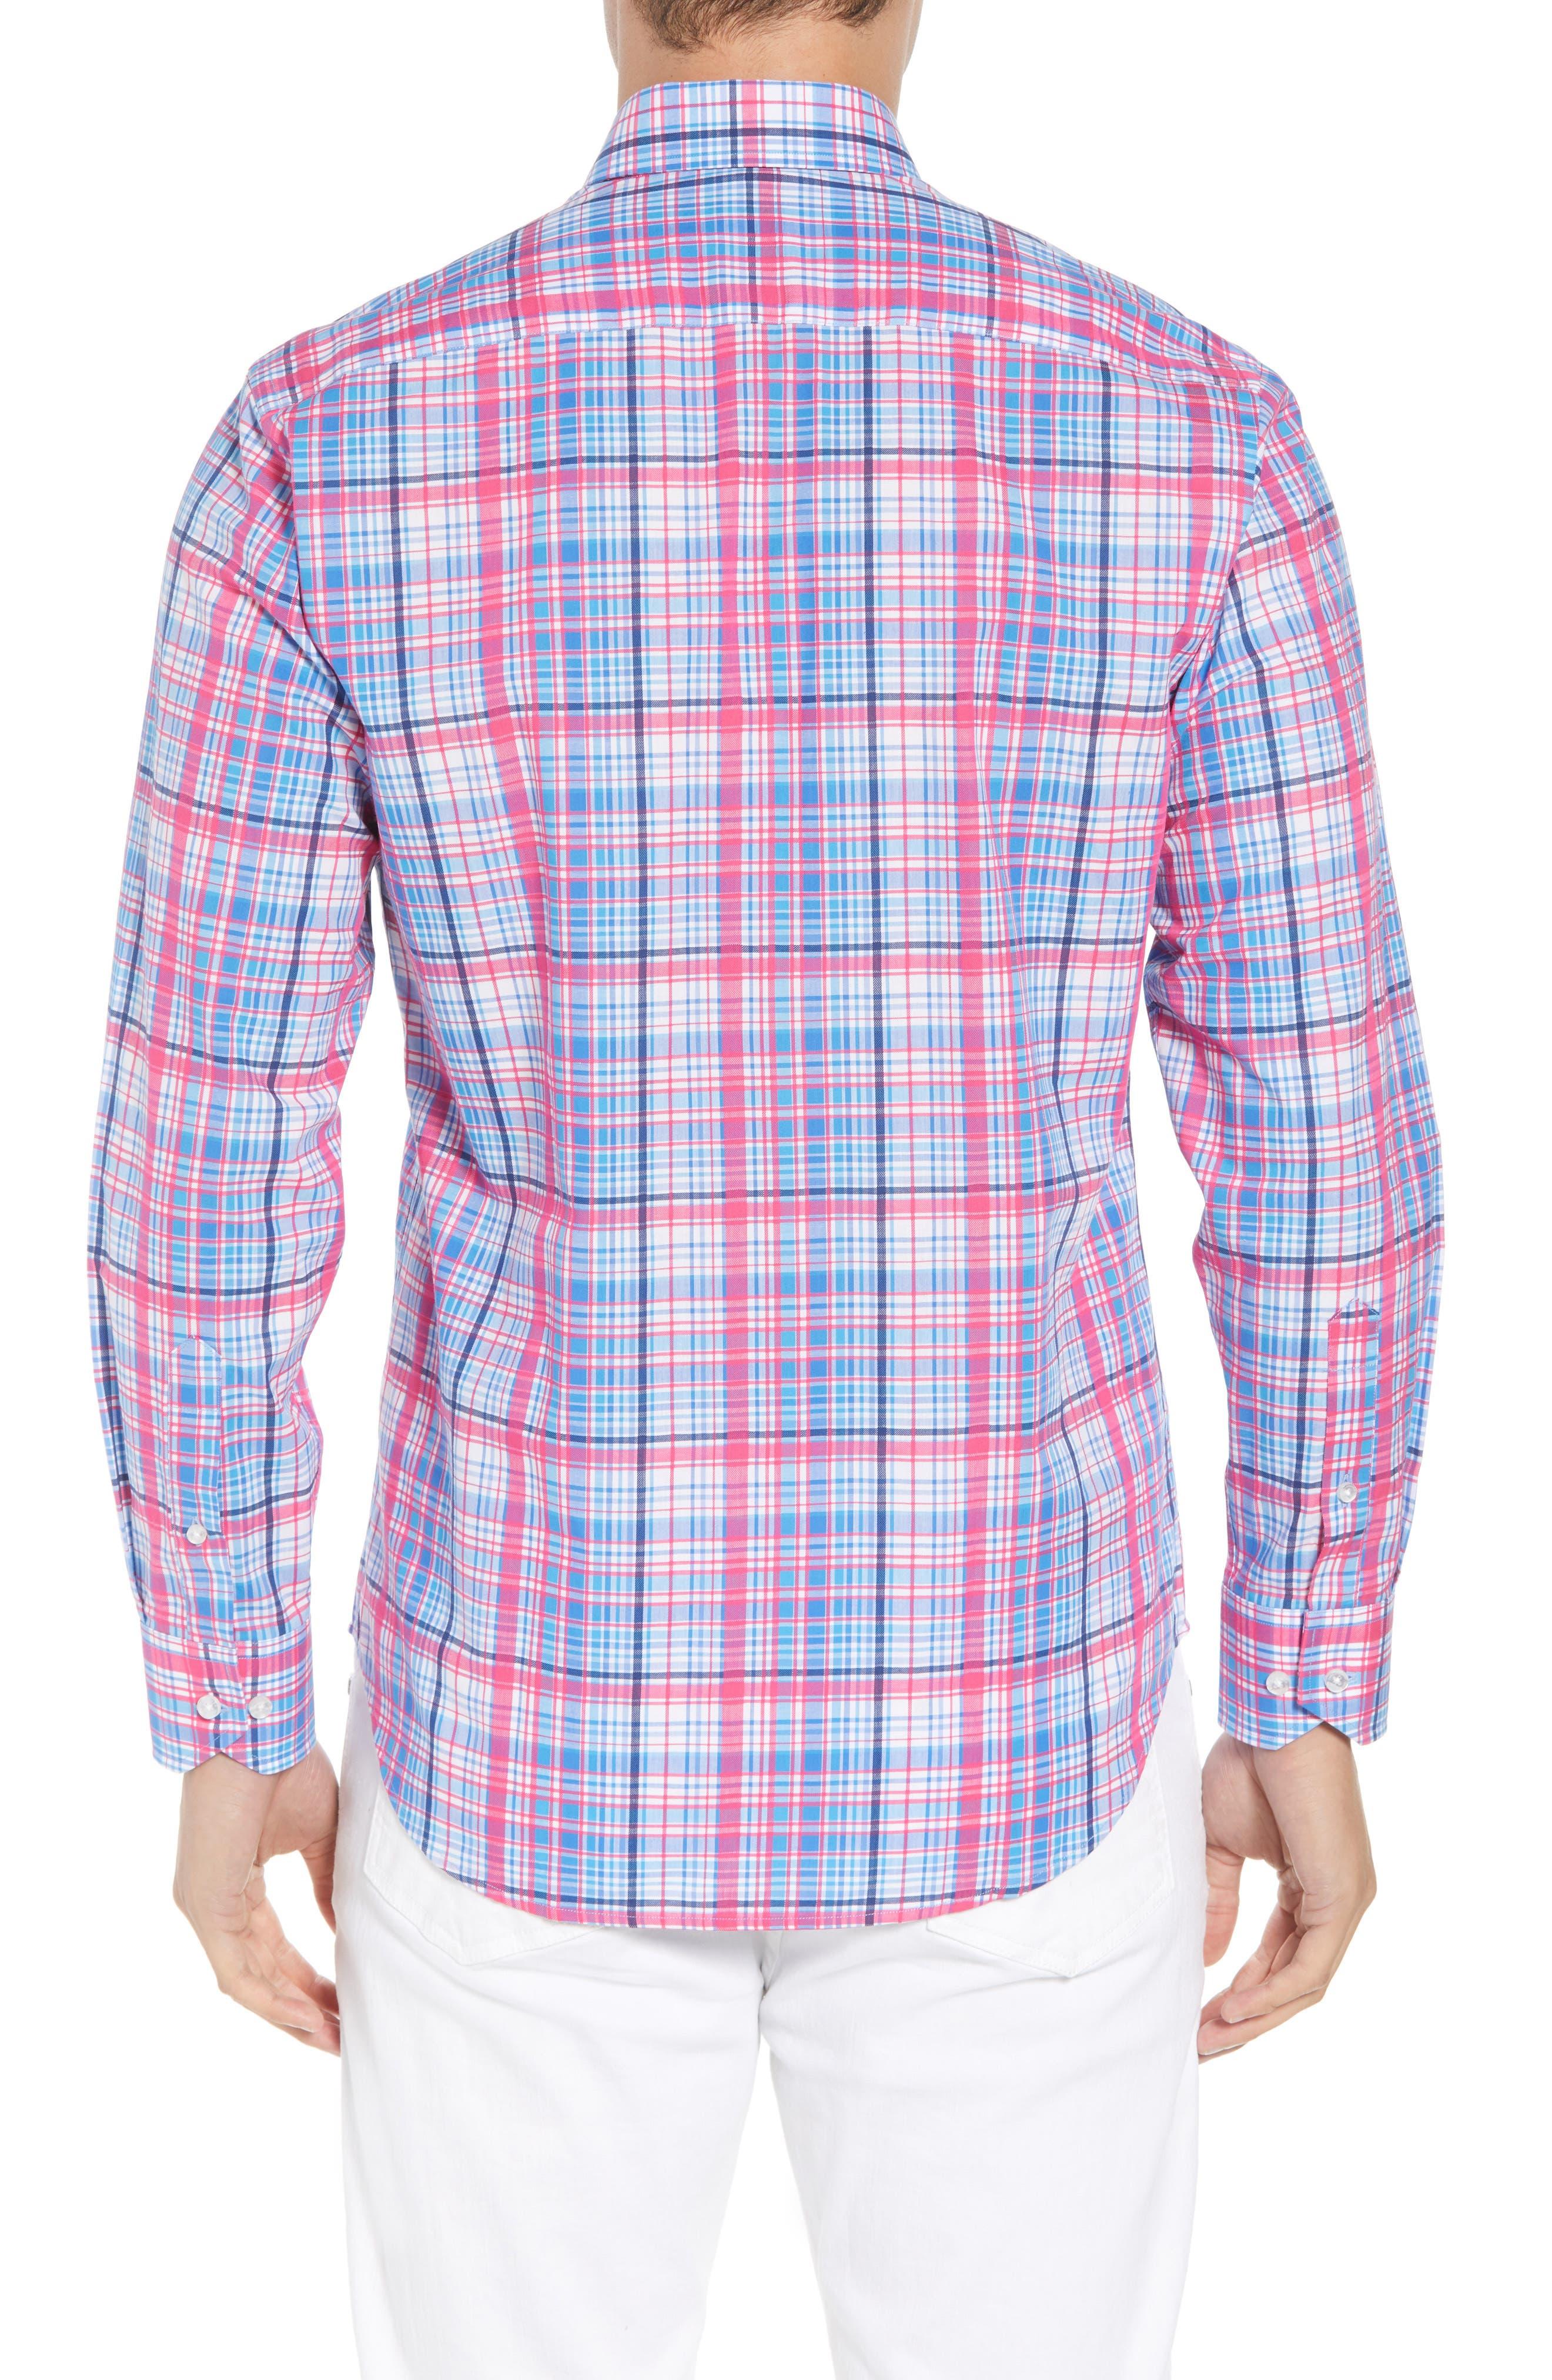 Beacon Regular Fit Plaid Sport Shirt,                             Alternate thumbnail 2, color,                             650